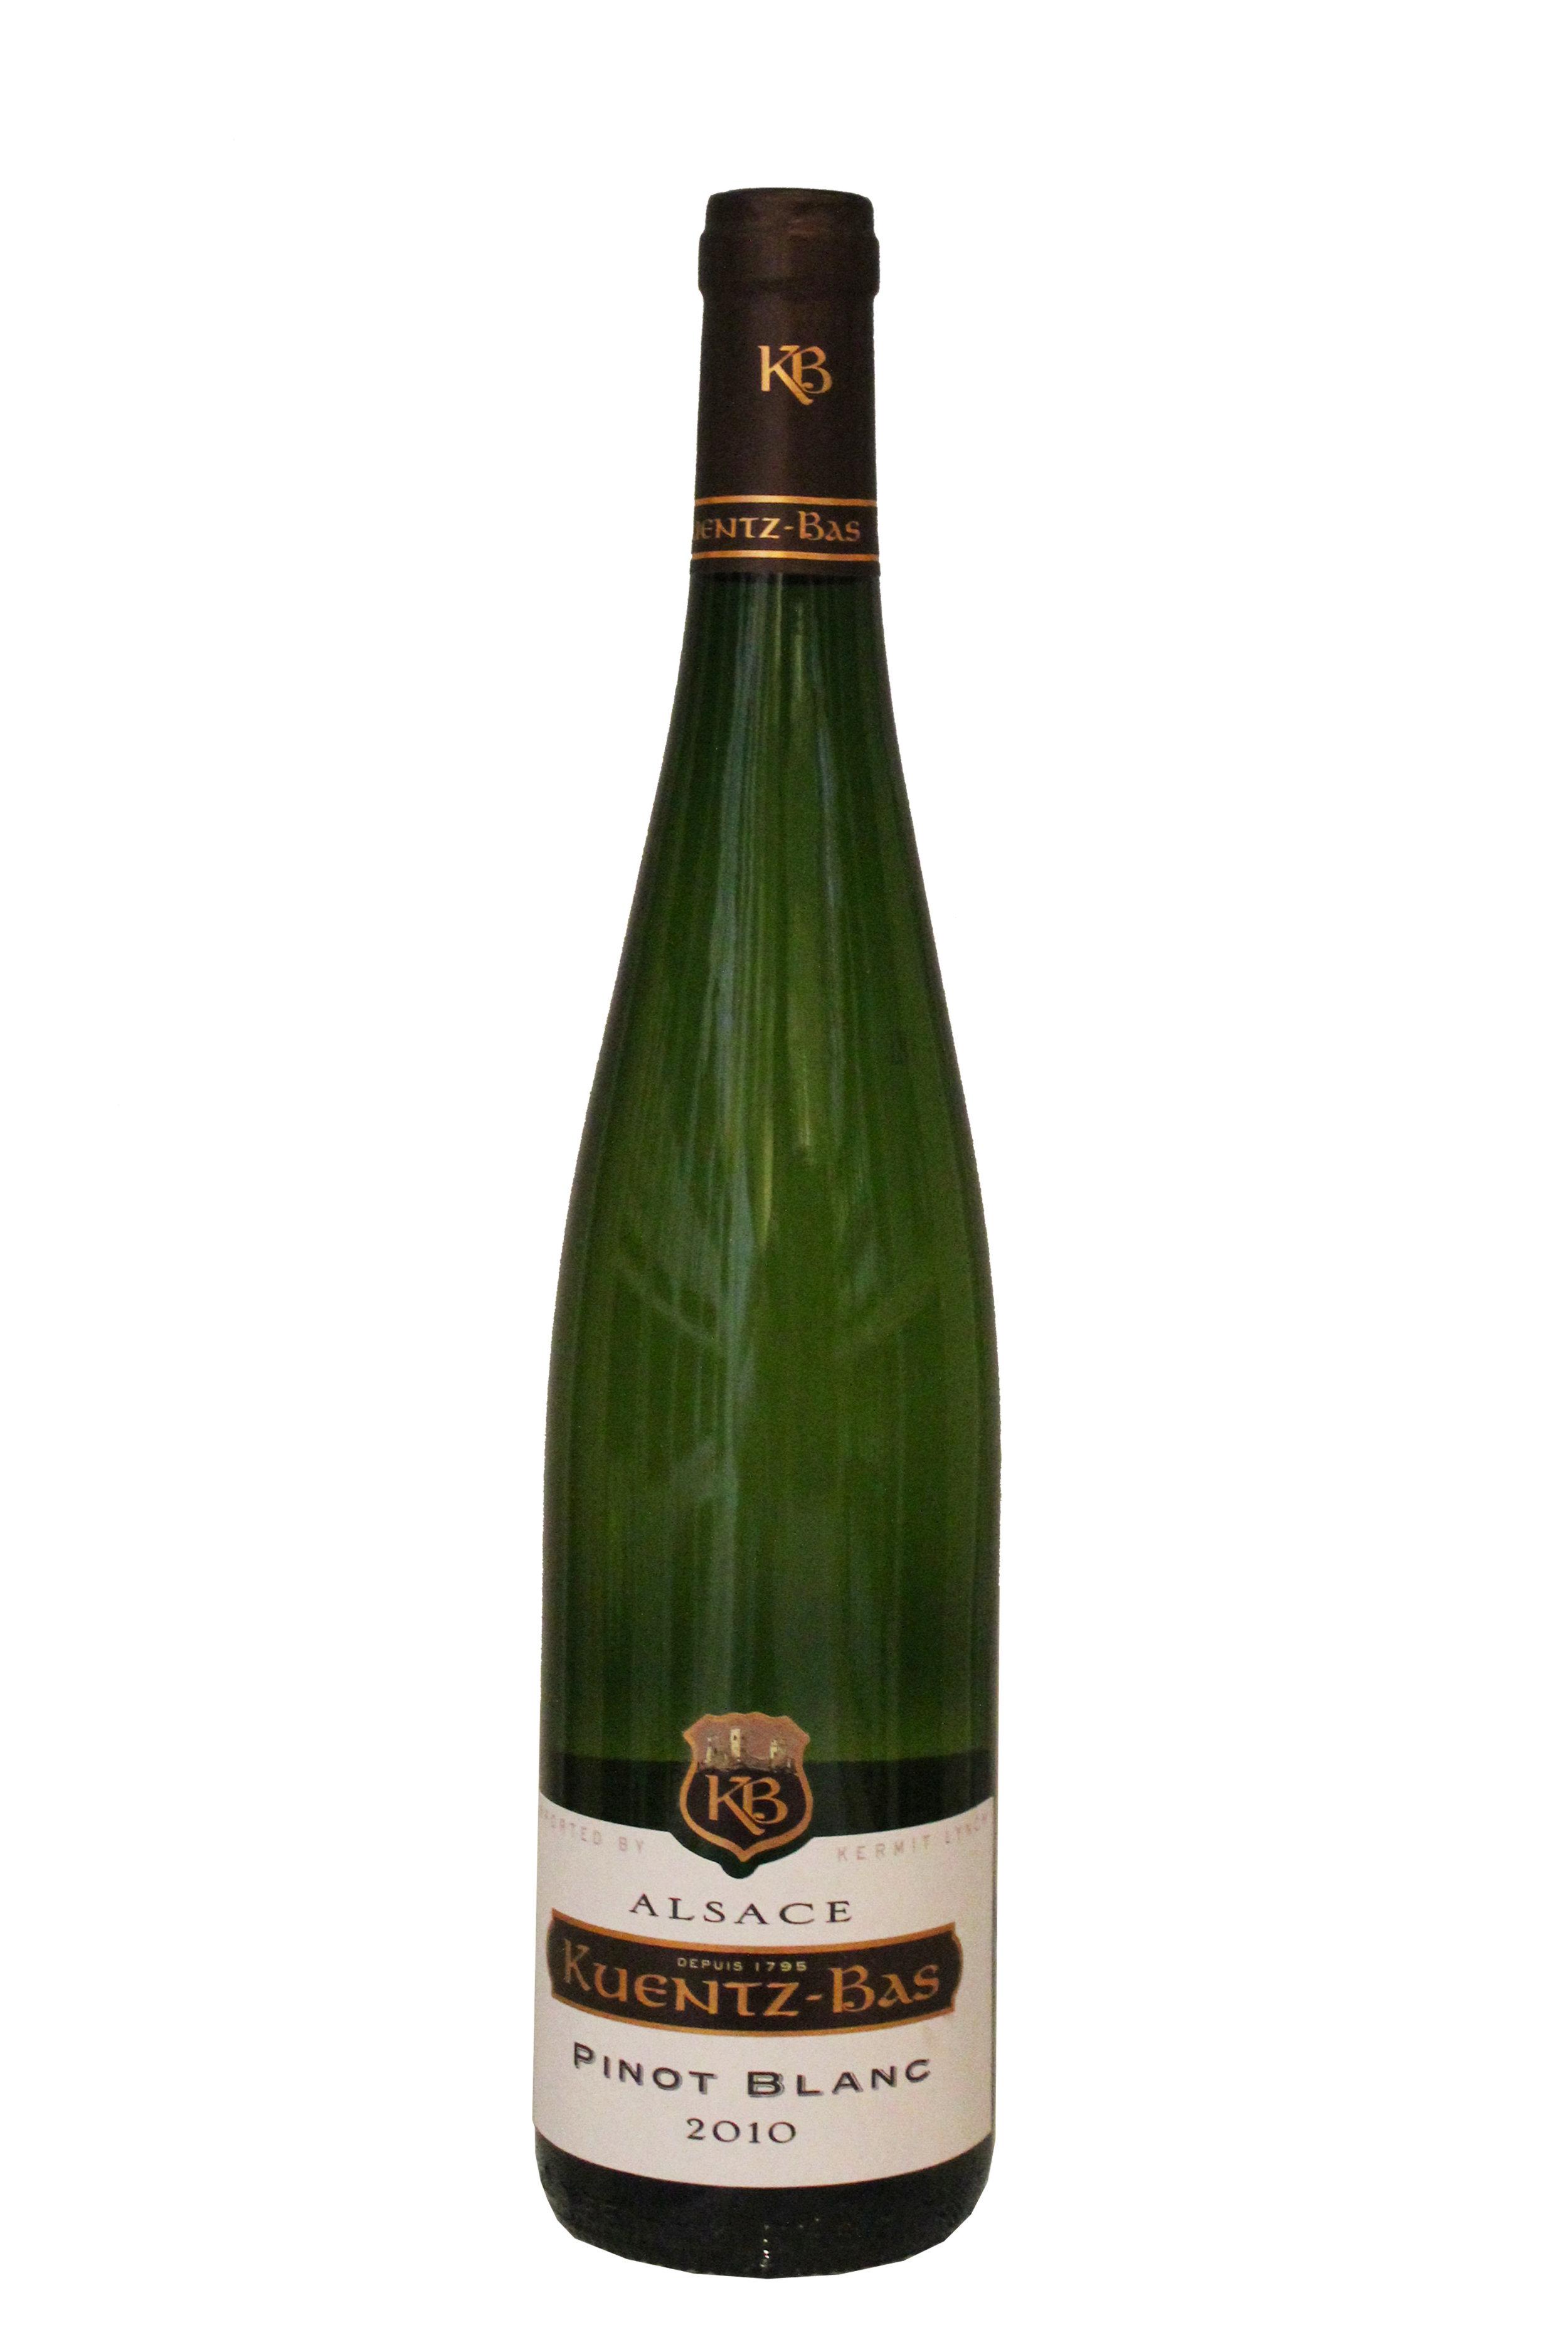 Pinot Blanc Kuentz-Bas, France